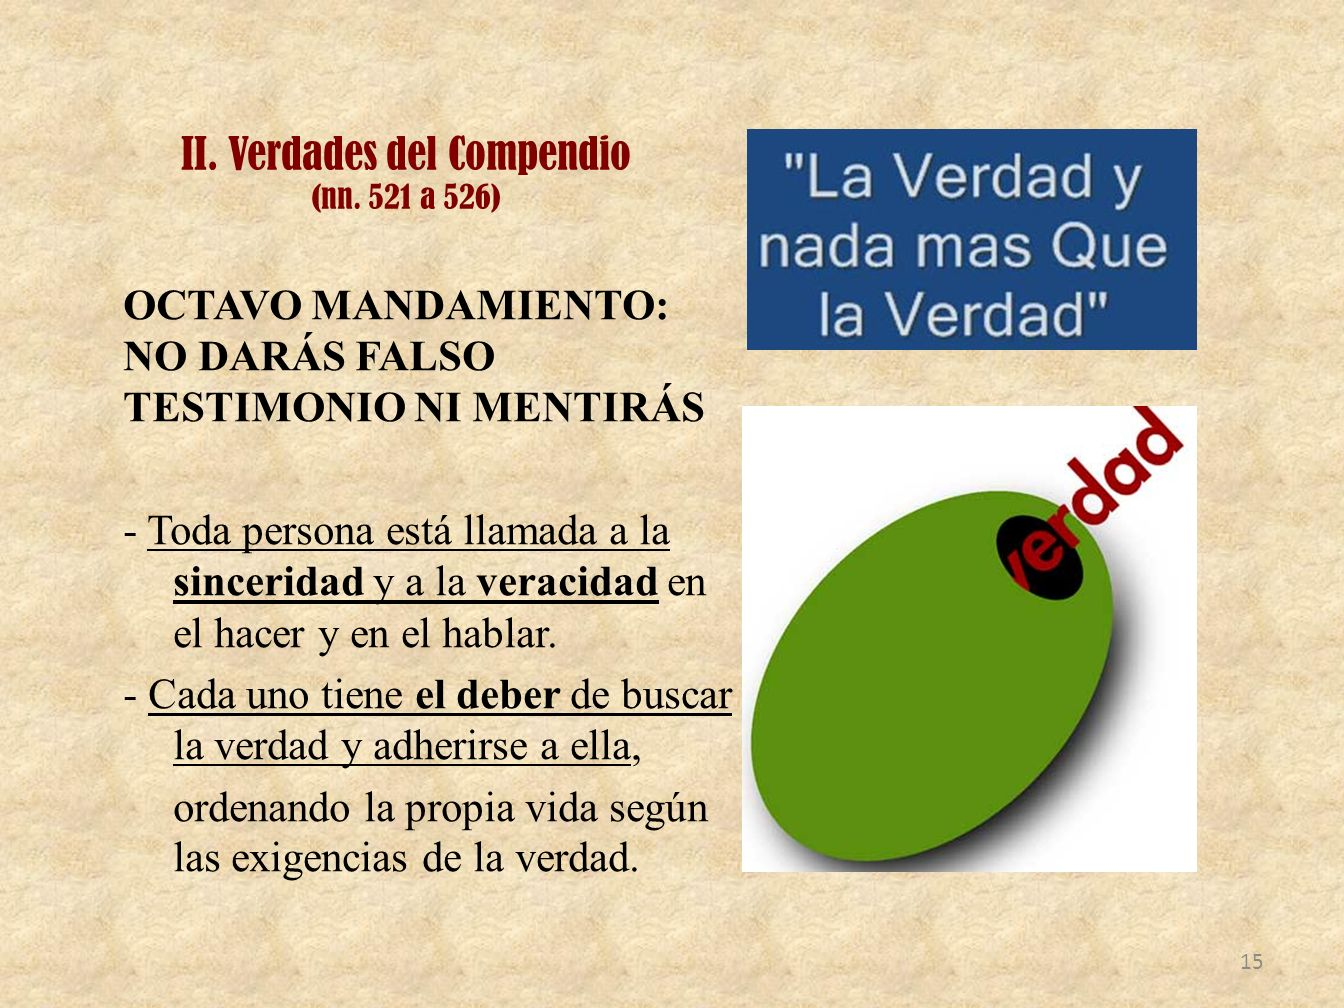 II. Verdades del Compendio (nn. 521 a 526)